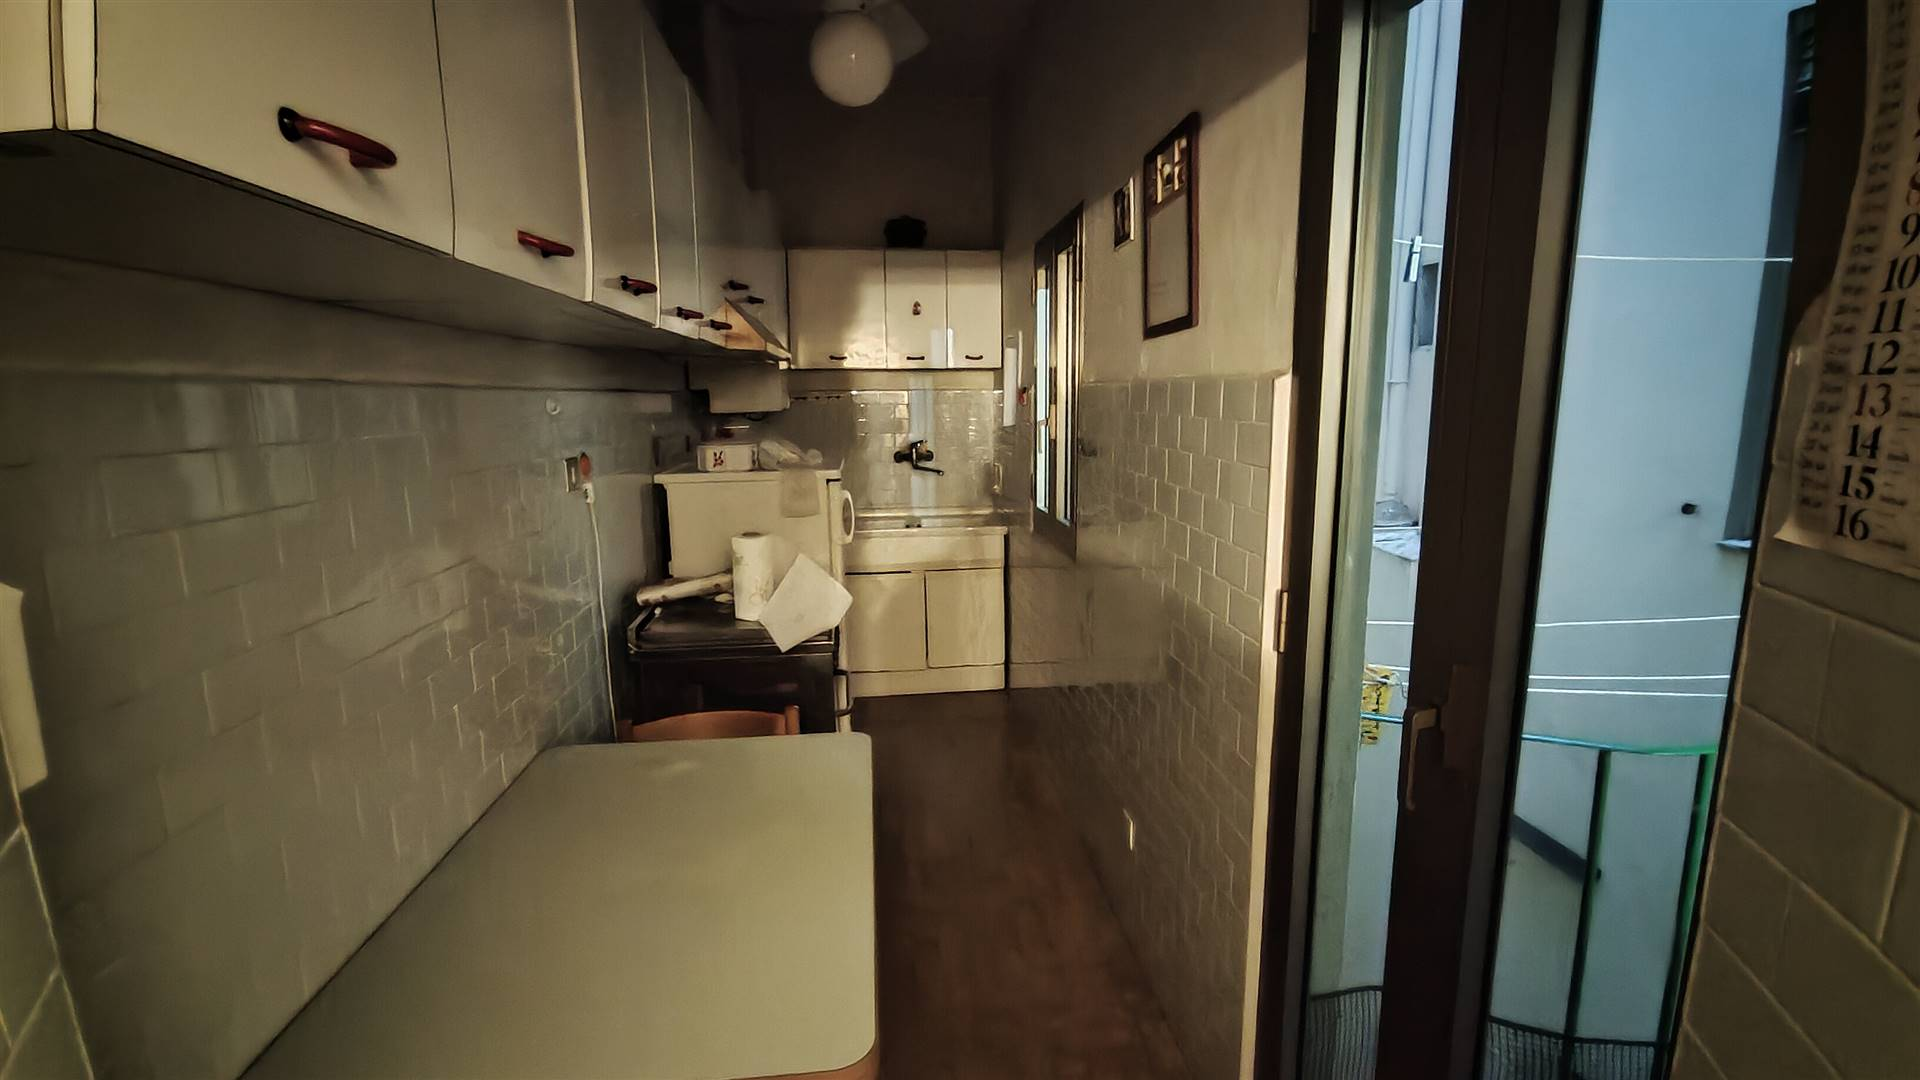 cucinotto - Rif. 4909RA86197